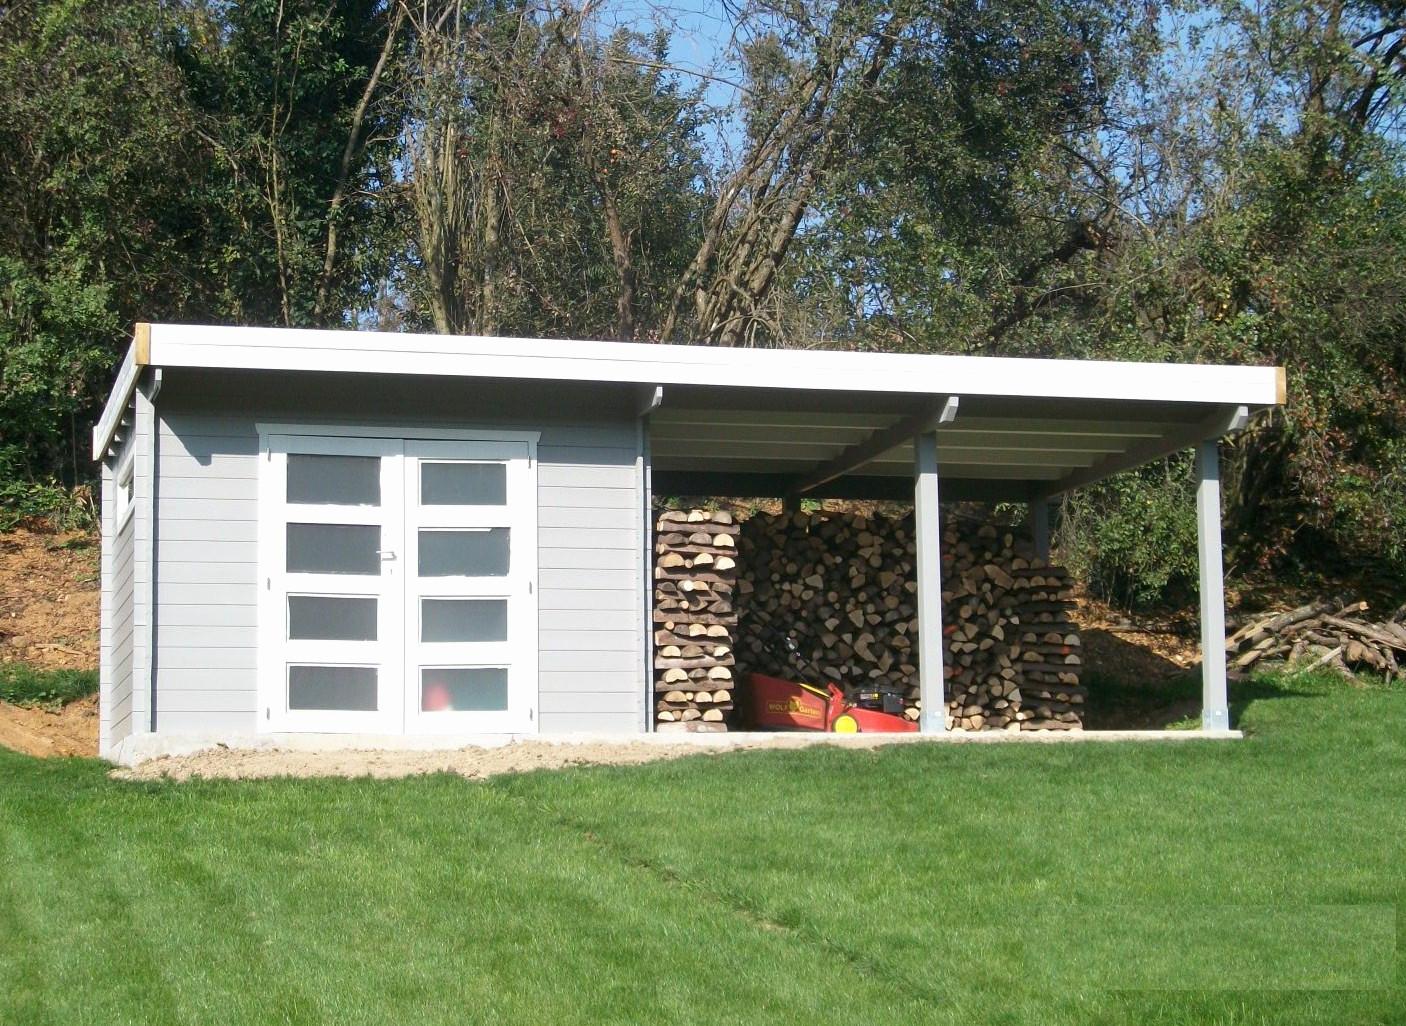 Abri De Jardin Pas Cher Brico Depot - Mailleraye.fr Jardin pour Abris De Jardin Brico Depot